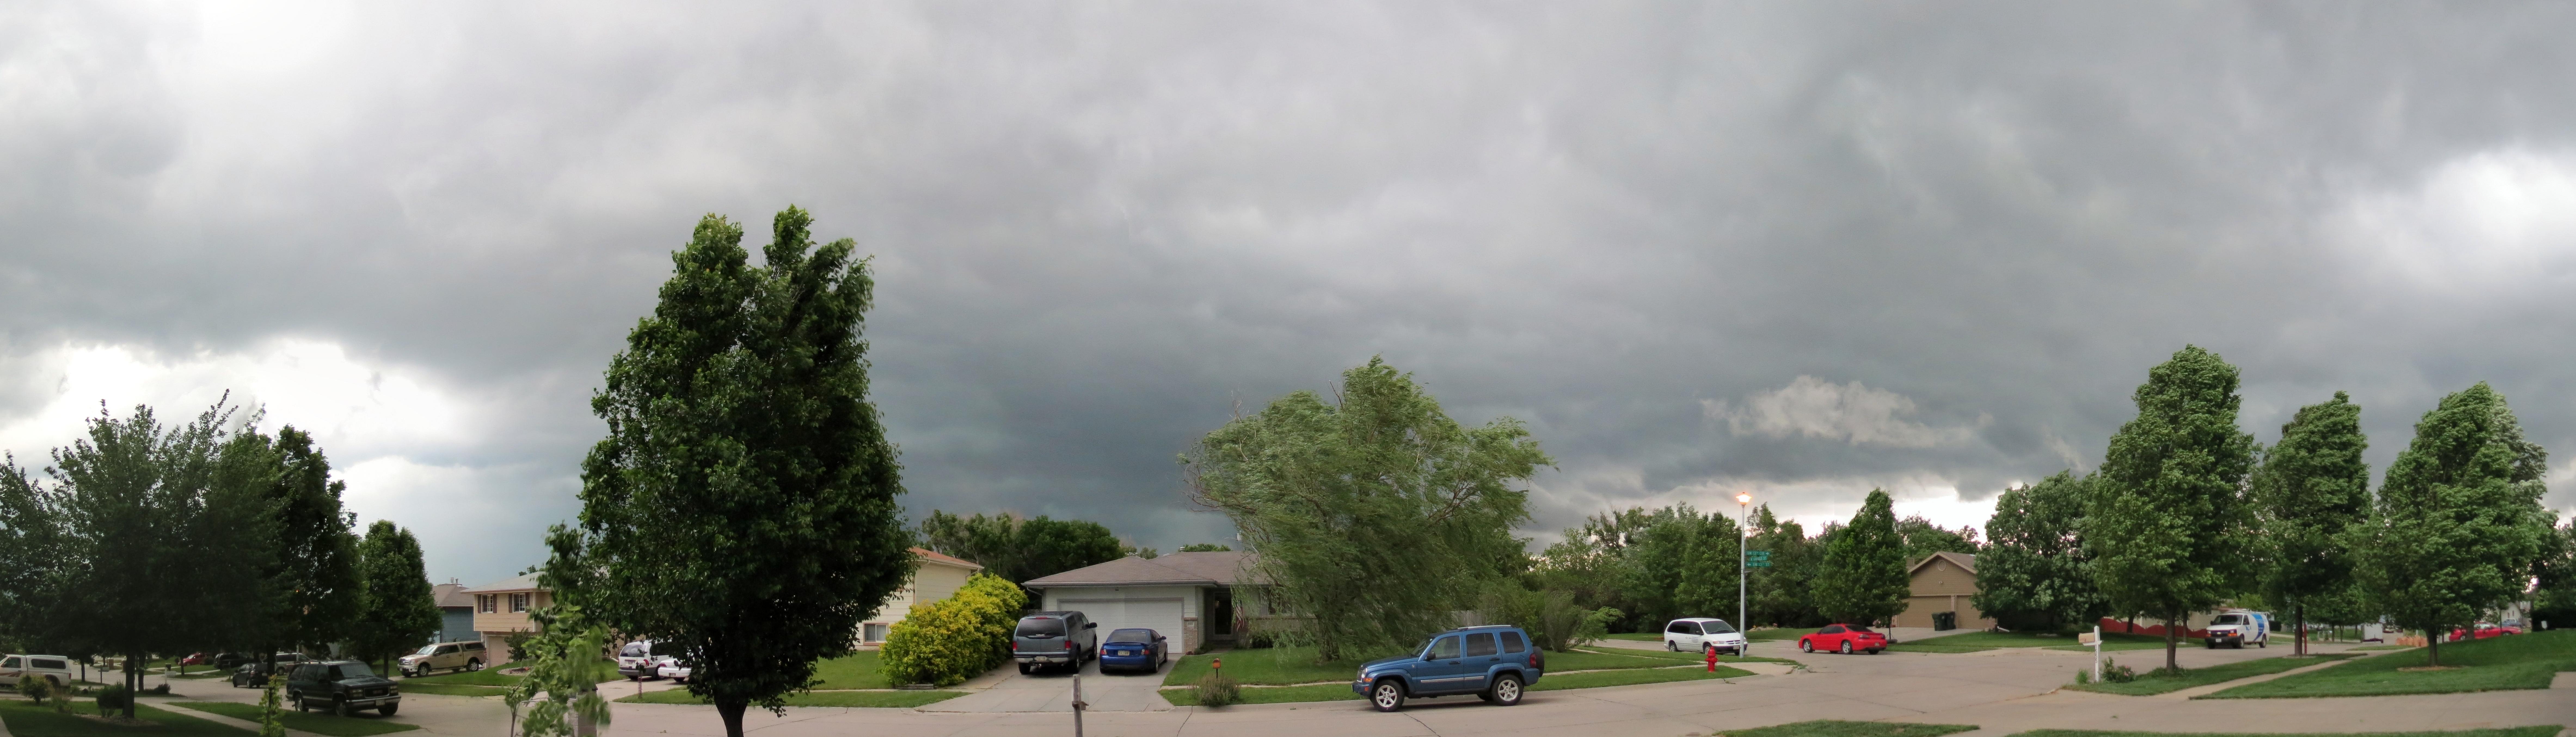 Last night's storm